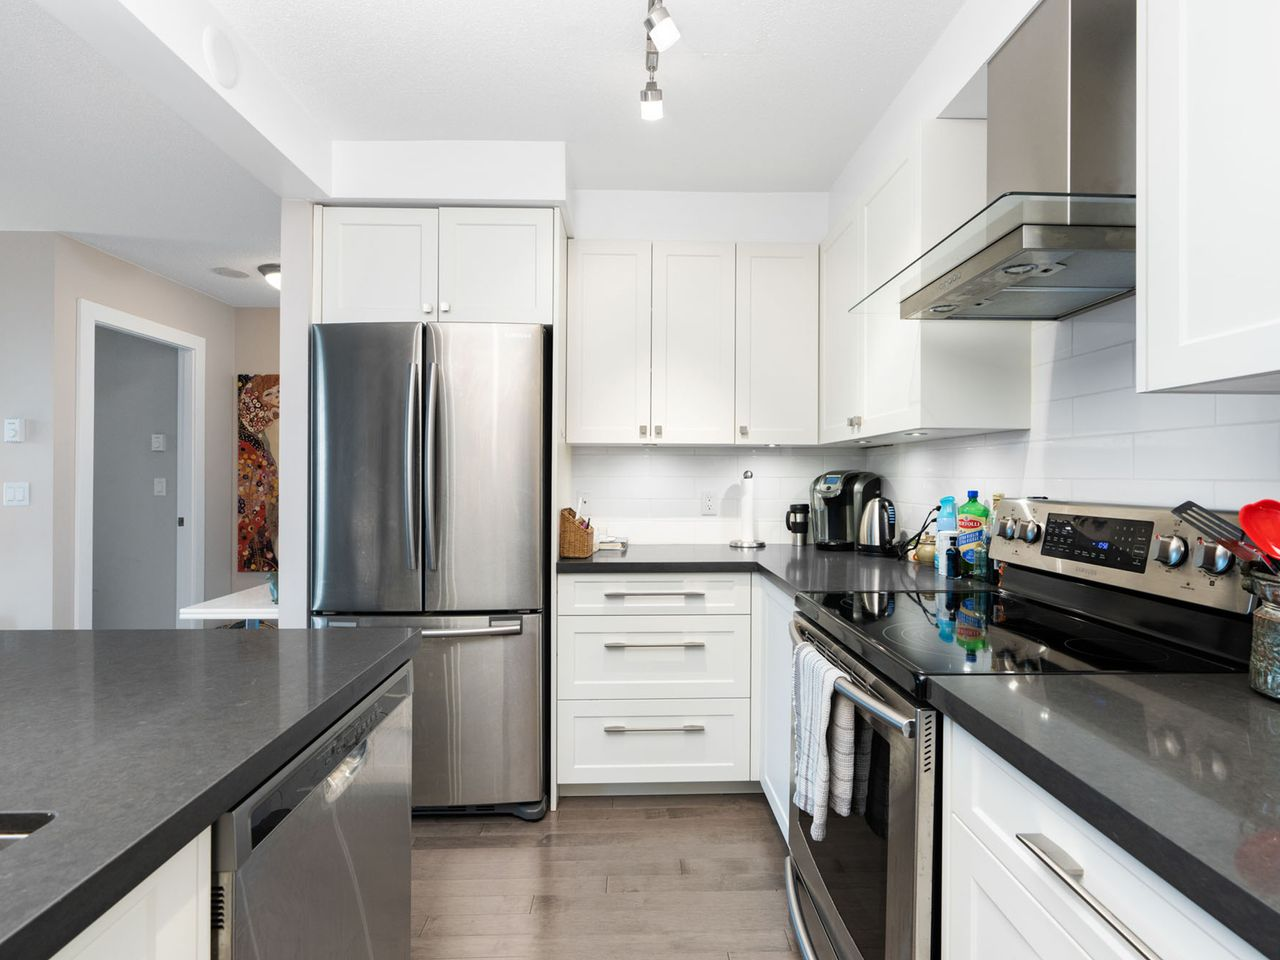 807-4160-albert-st_gavin-4624 at 807 - 4160 Albert Street, Vancouver Heights, Burnaby North